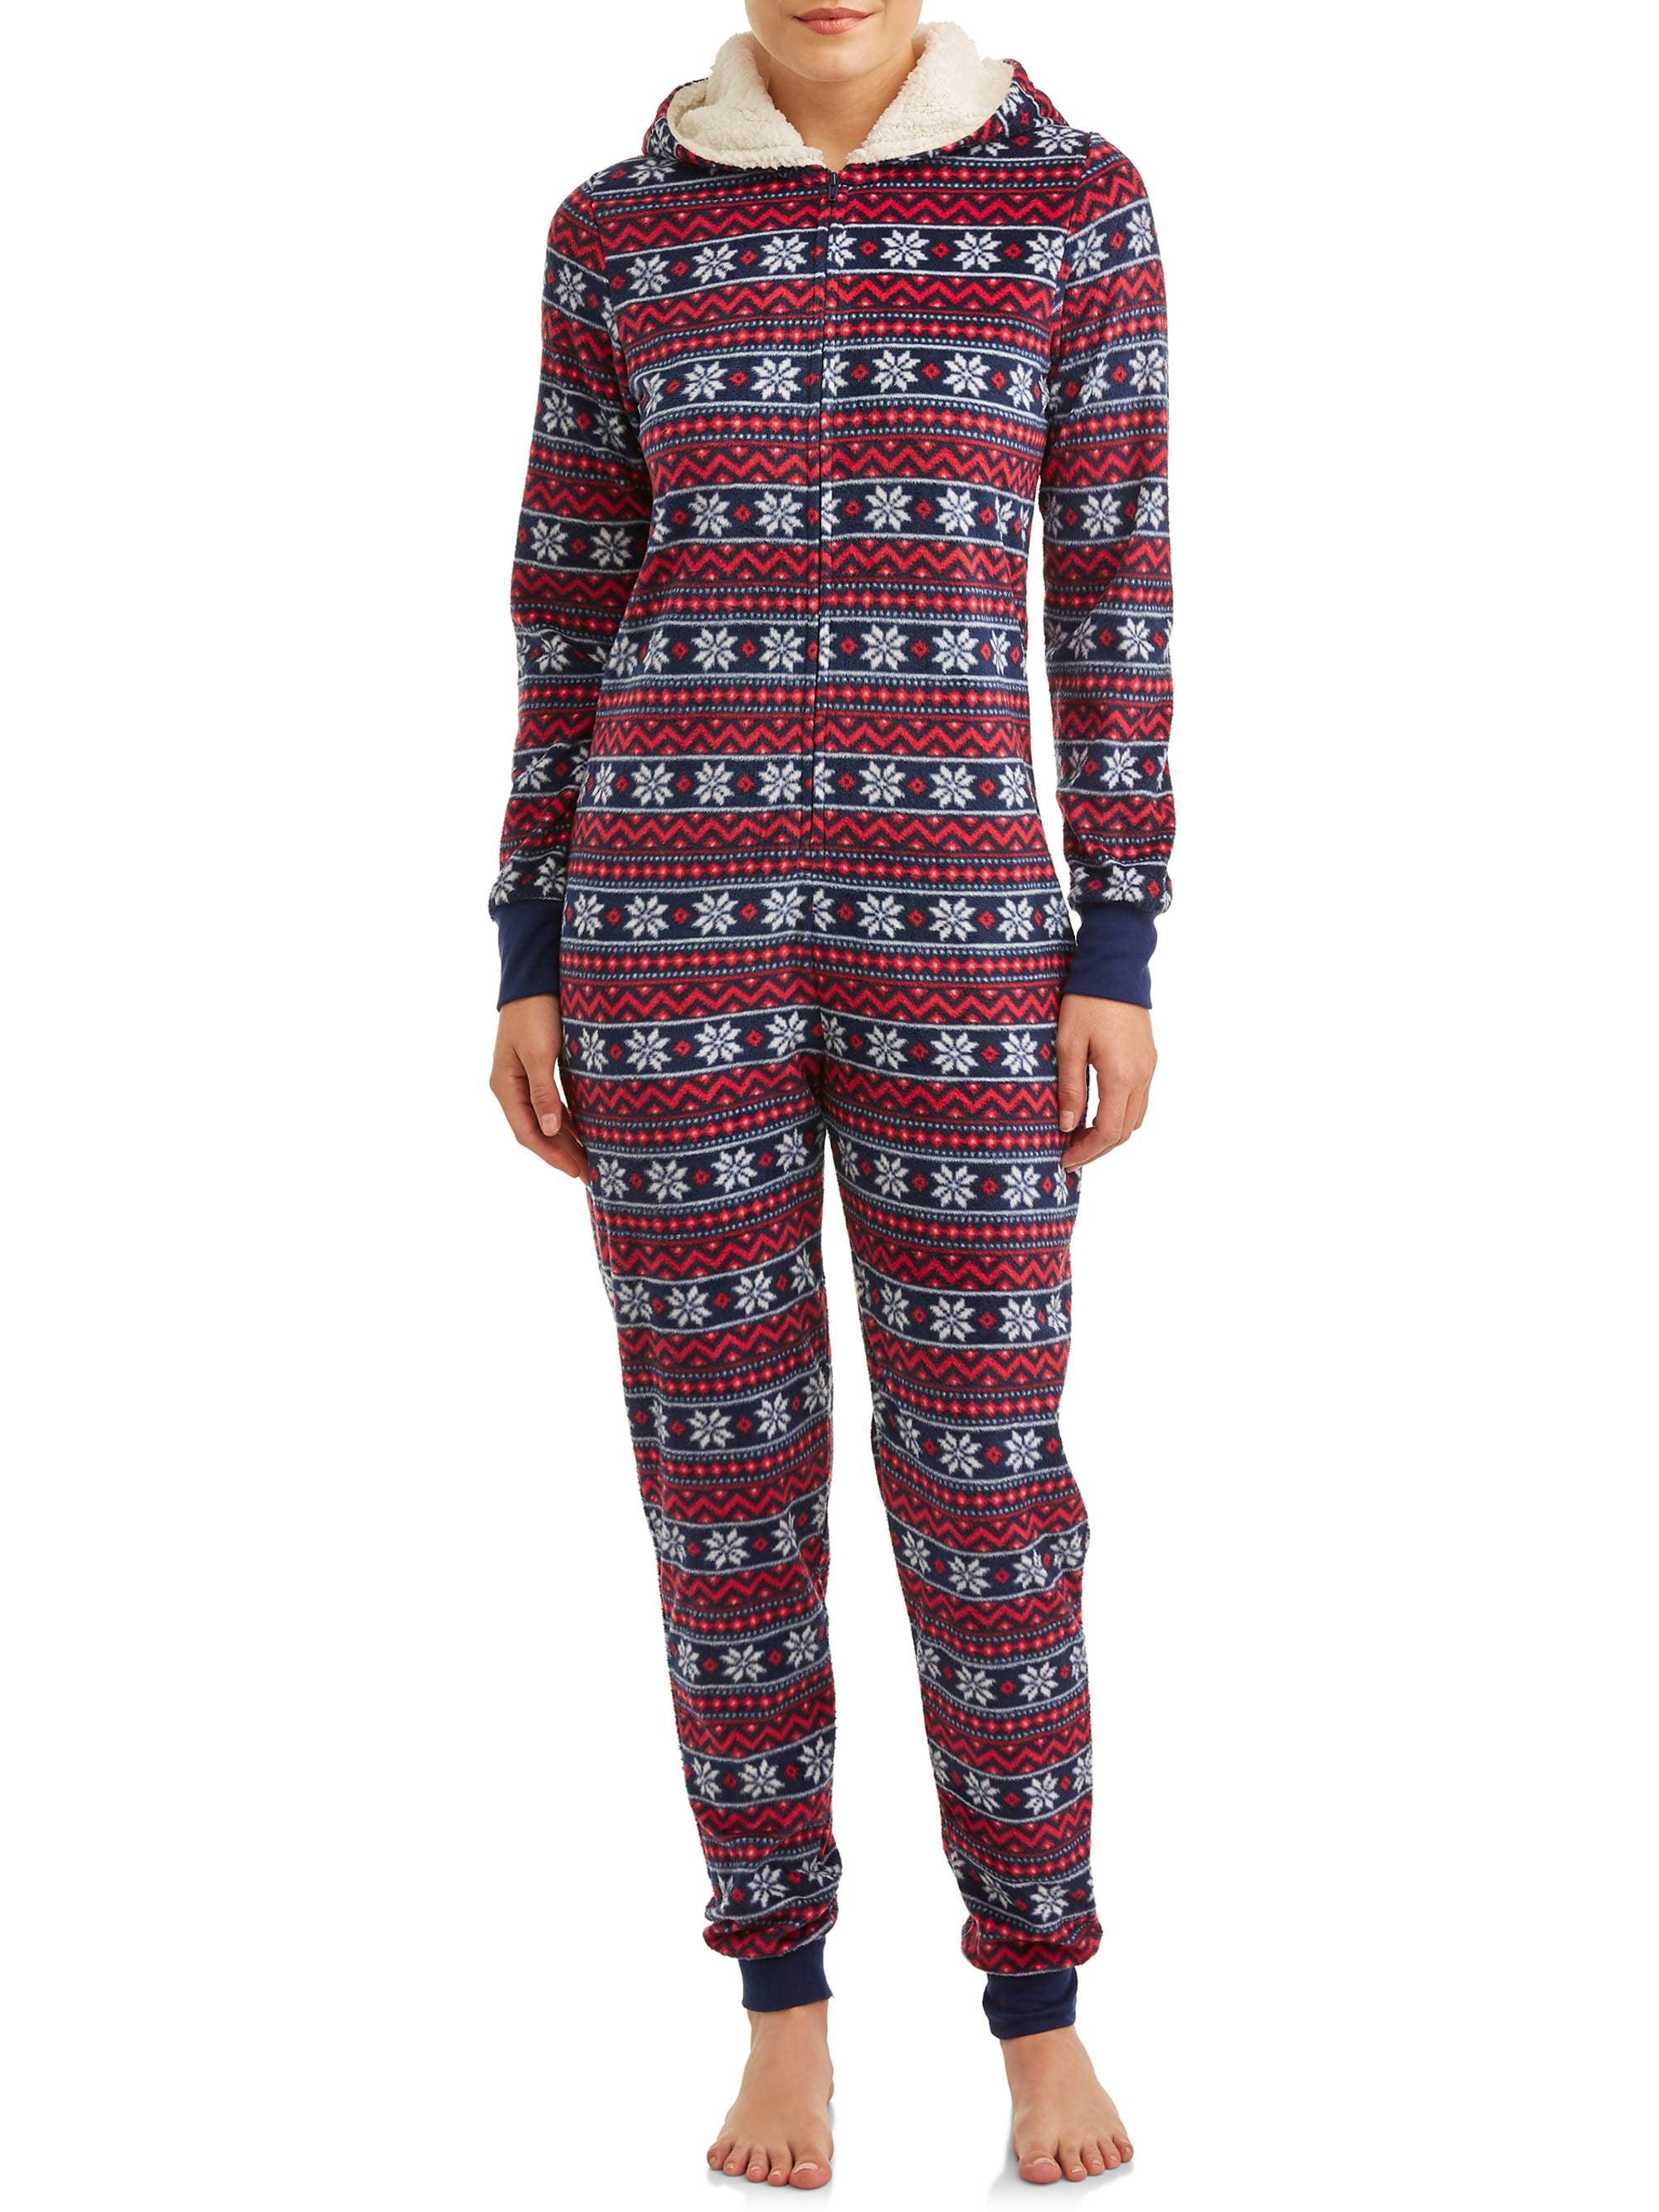 Mri-le2 Baby Girl Short Sleeve Bodysuit Dalmatian Heart 1 Kid Pajamas